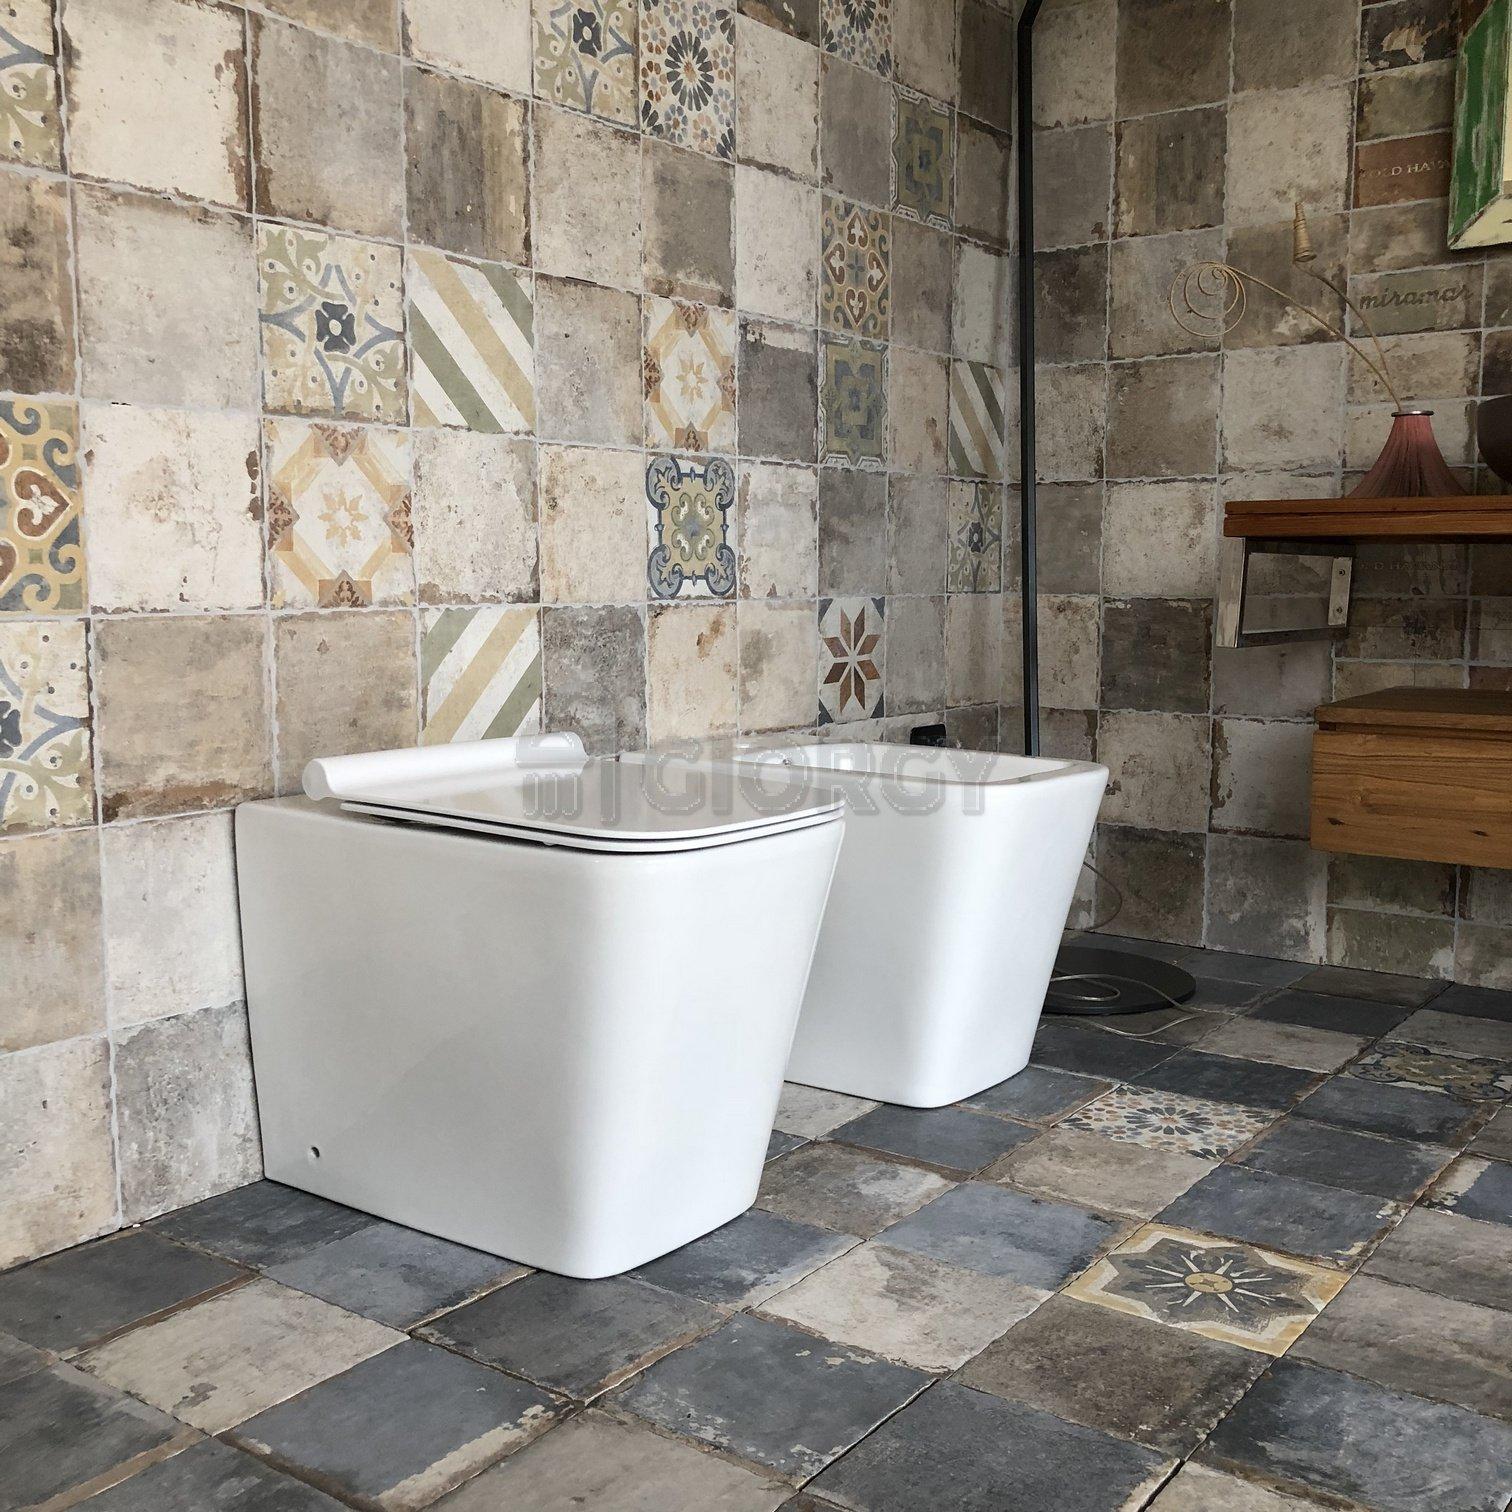 Sanitari a terra coppia filo muro moderno bagno vaso bidet for Offerta sanitari bagno